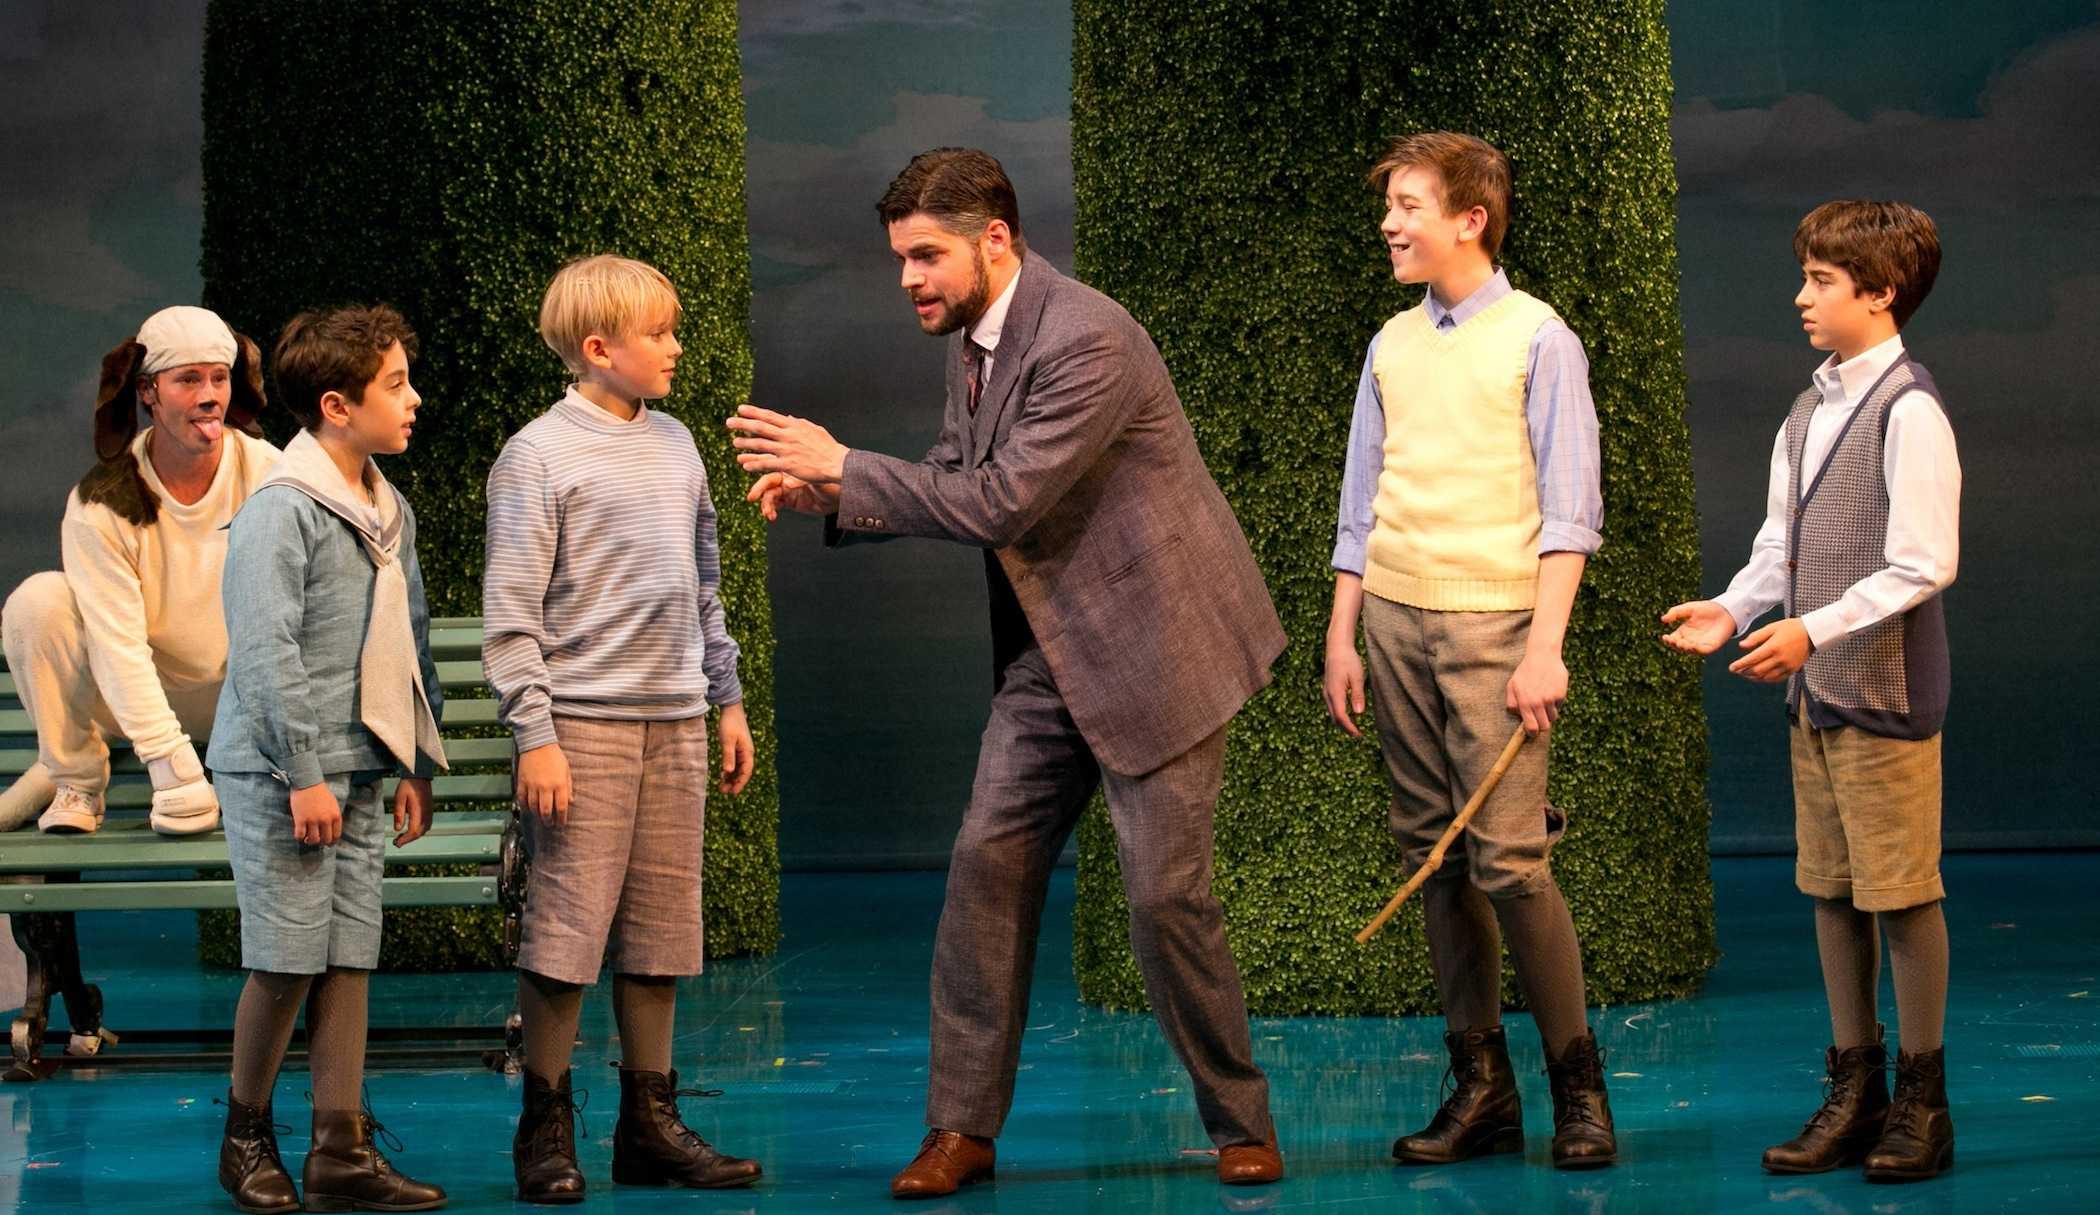 J. M. Barrie, Porthos, and the Llewelyn Davies boys play in Kensington Gardens in